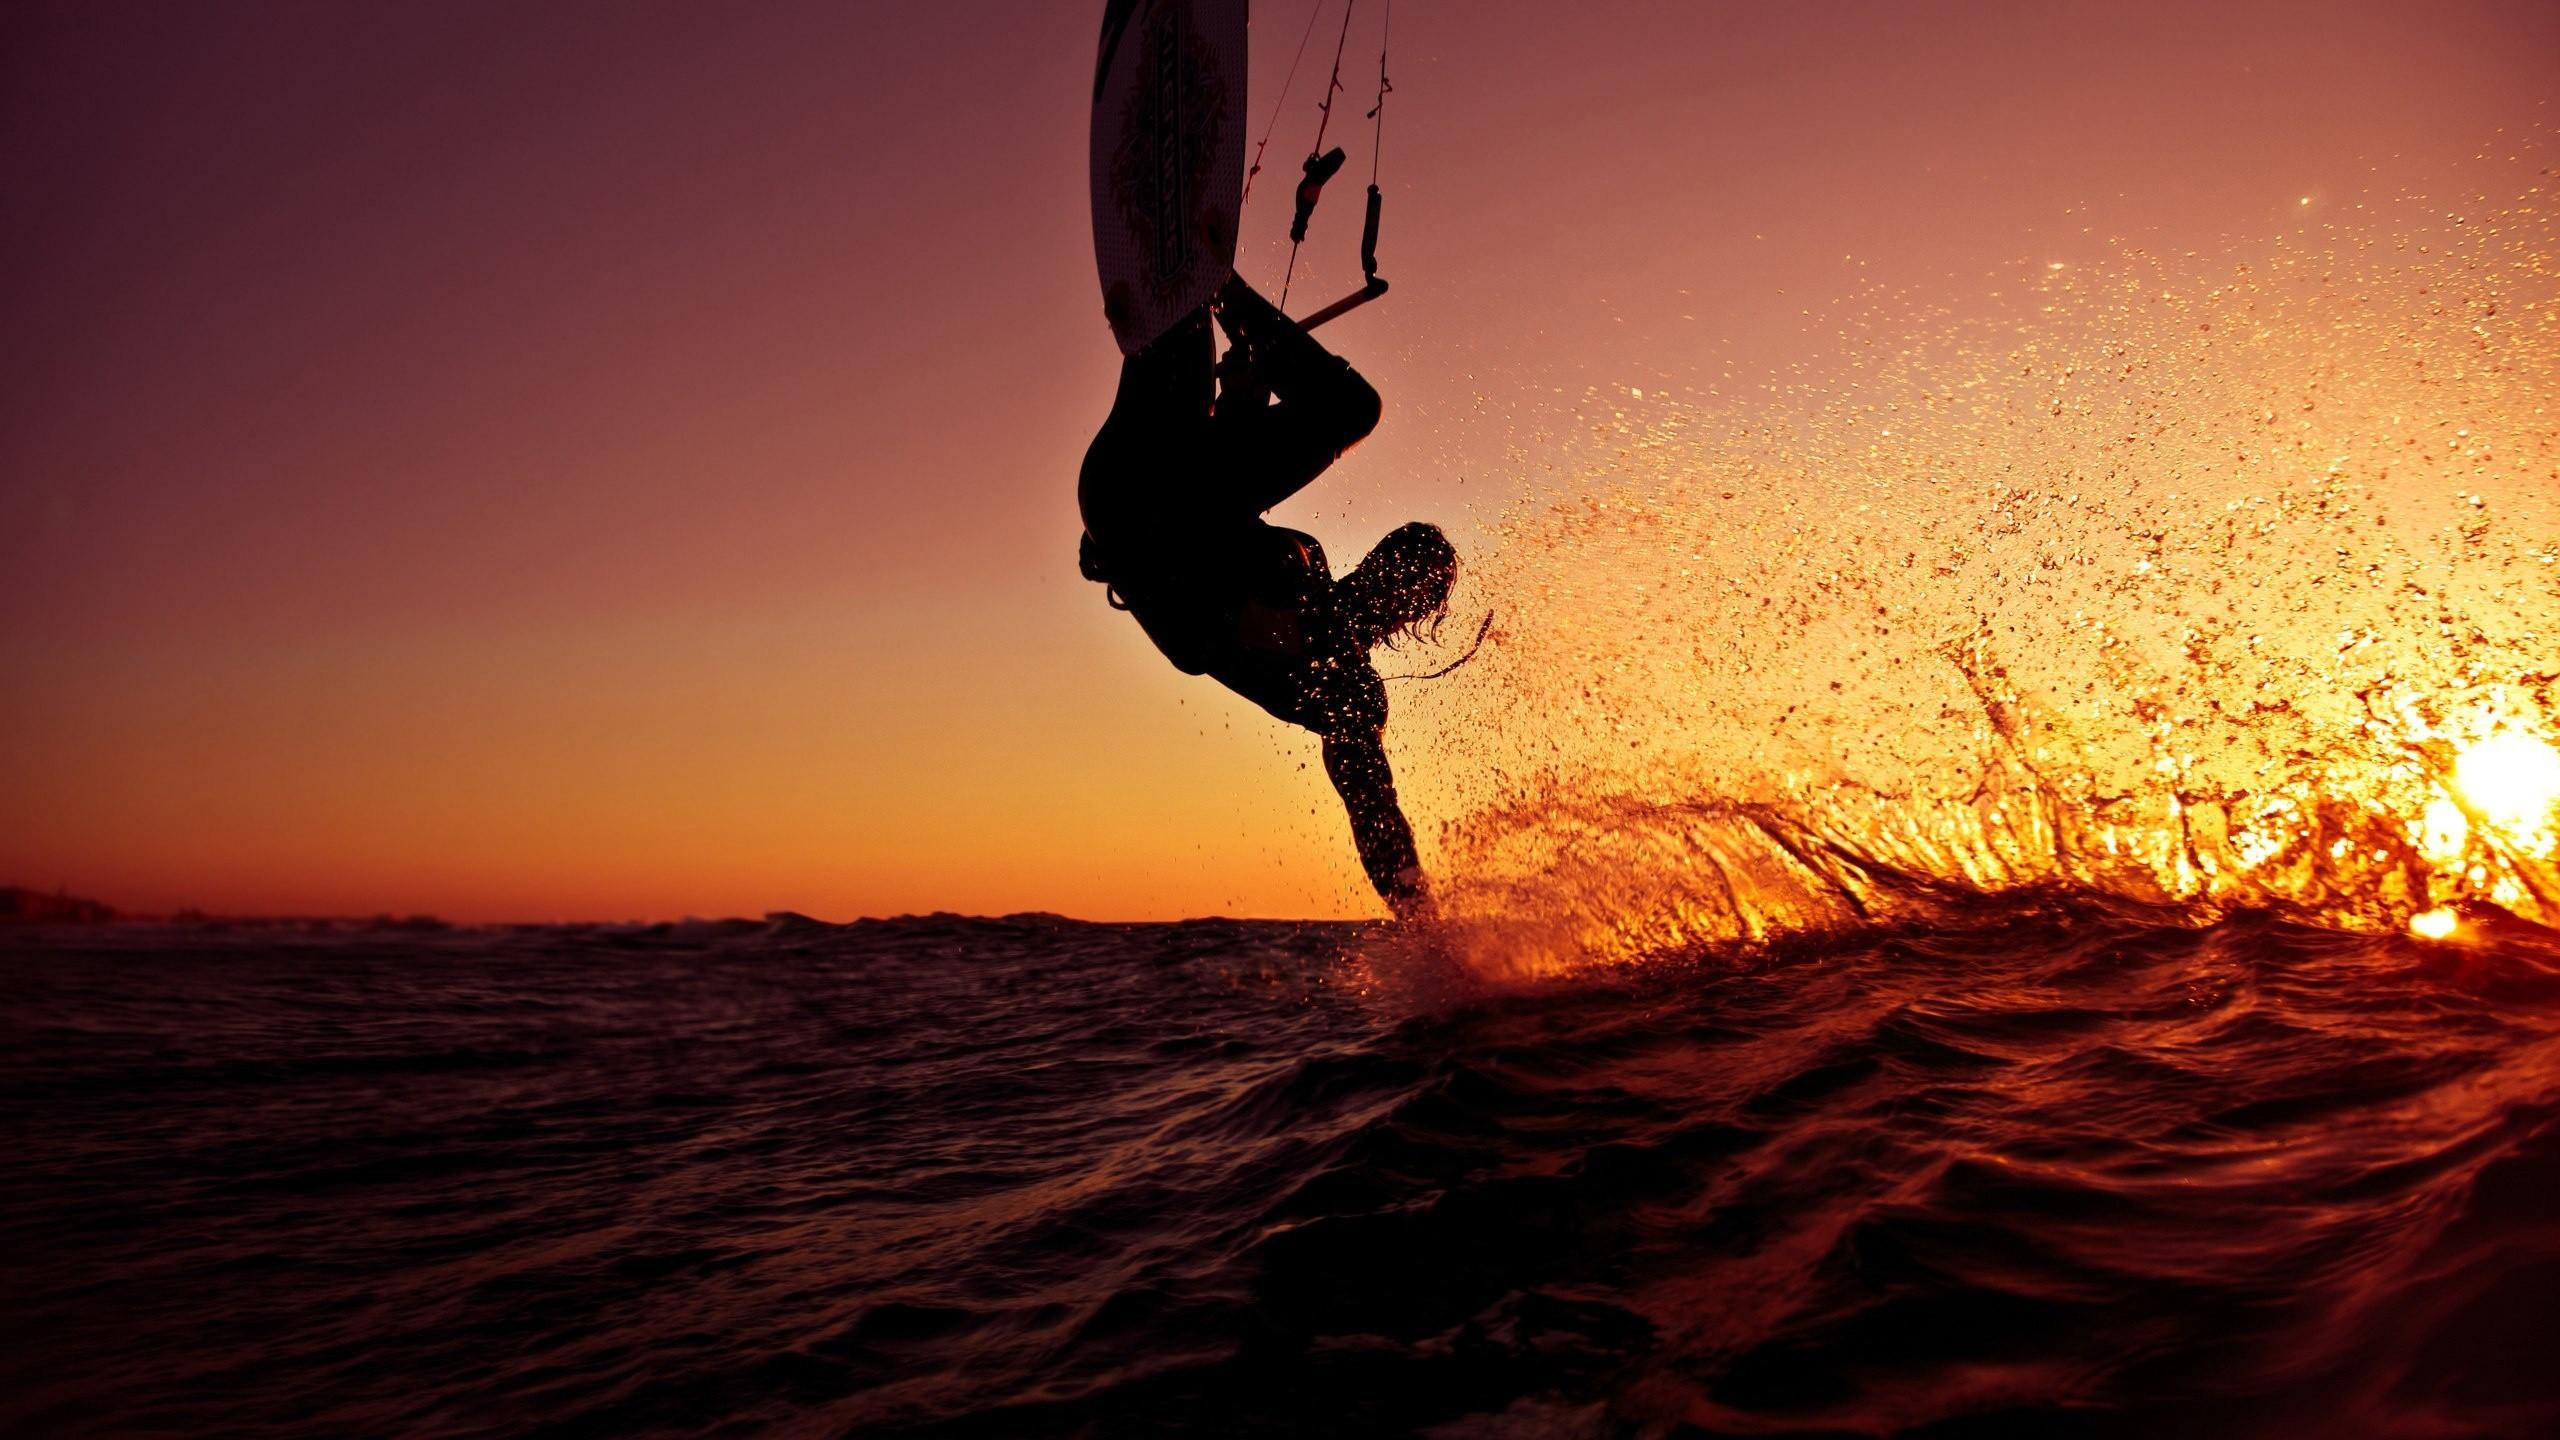 Sport Sunset Sea Evening Sun Dusk Surfing Wave 2560x1440 Px